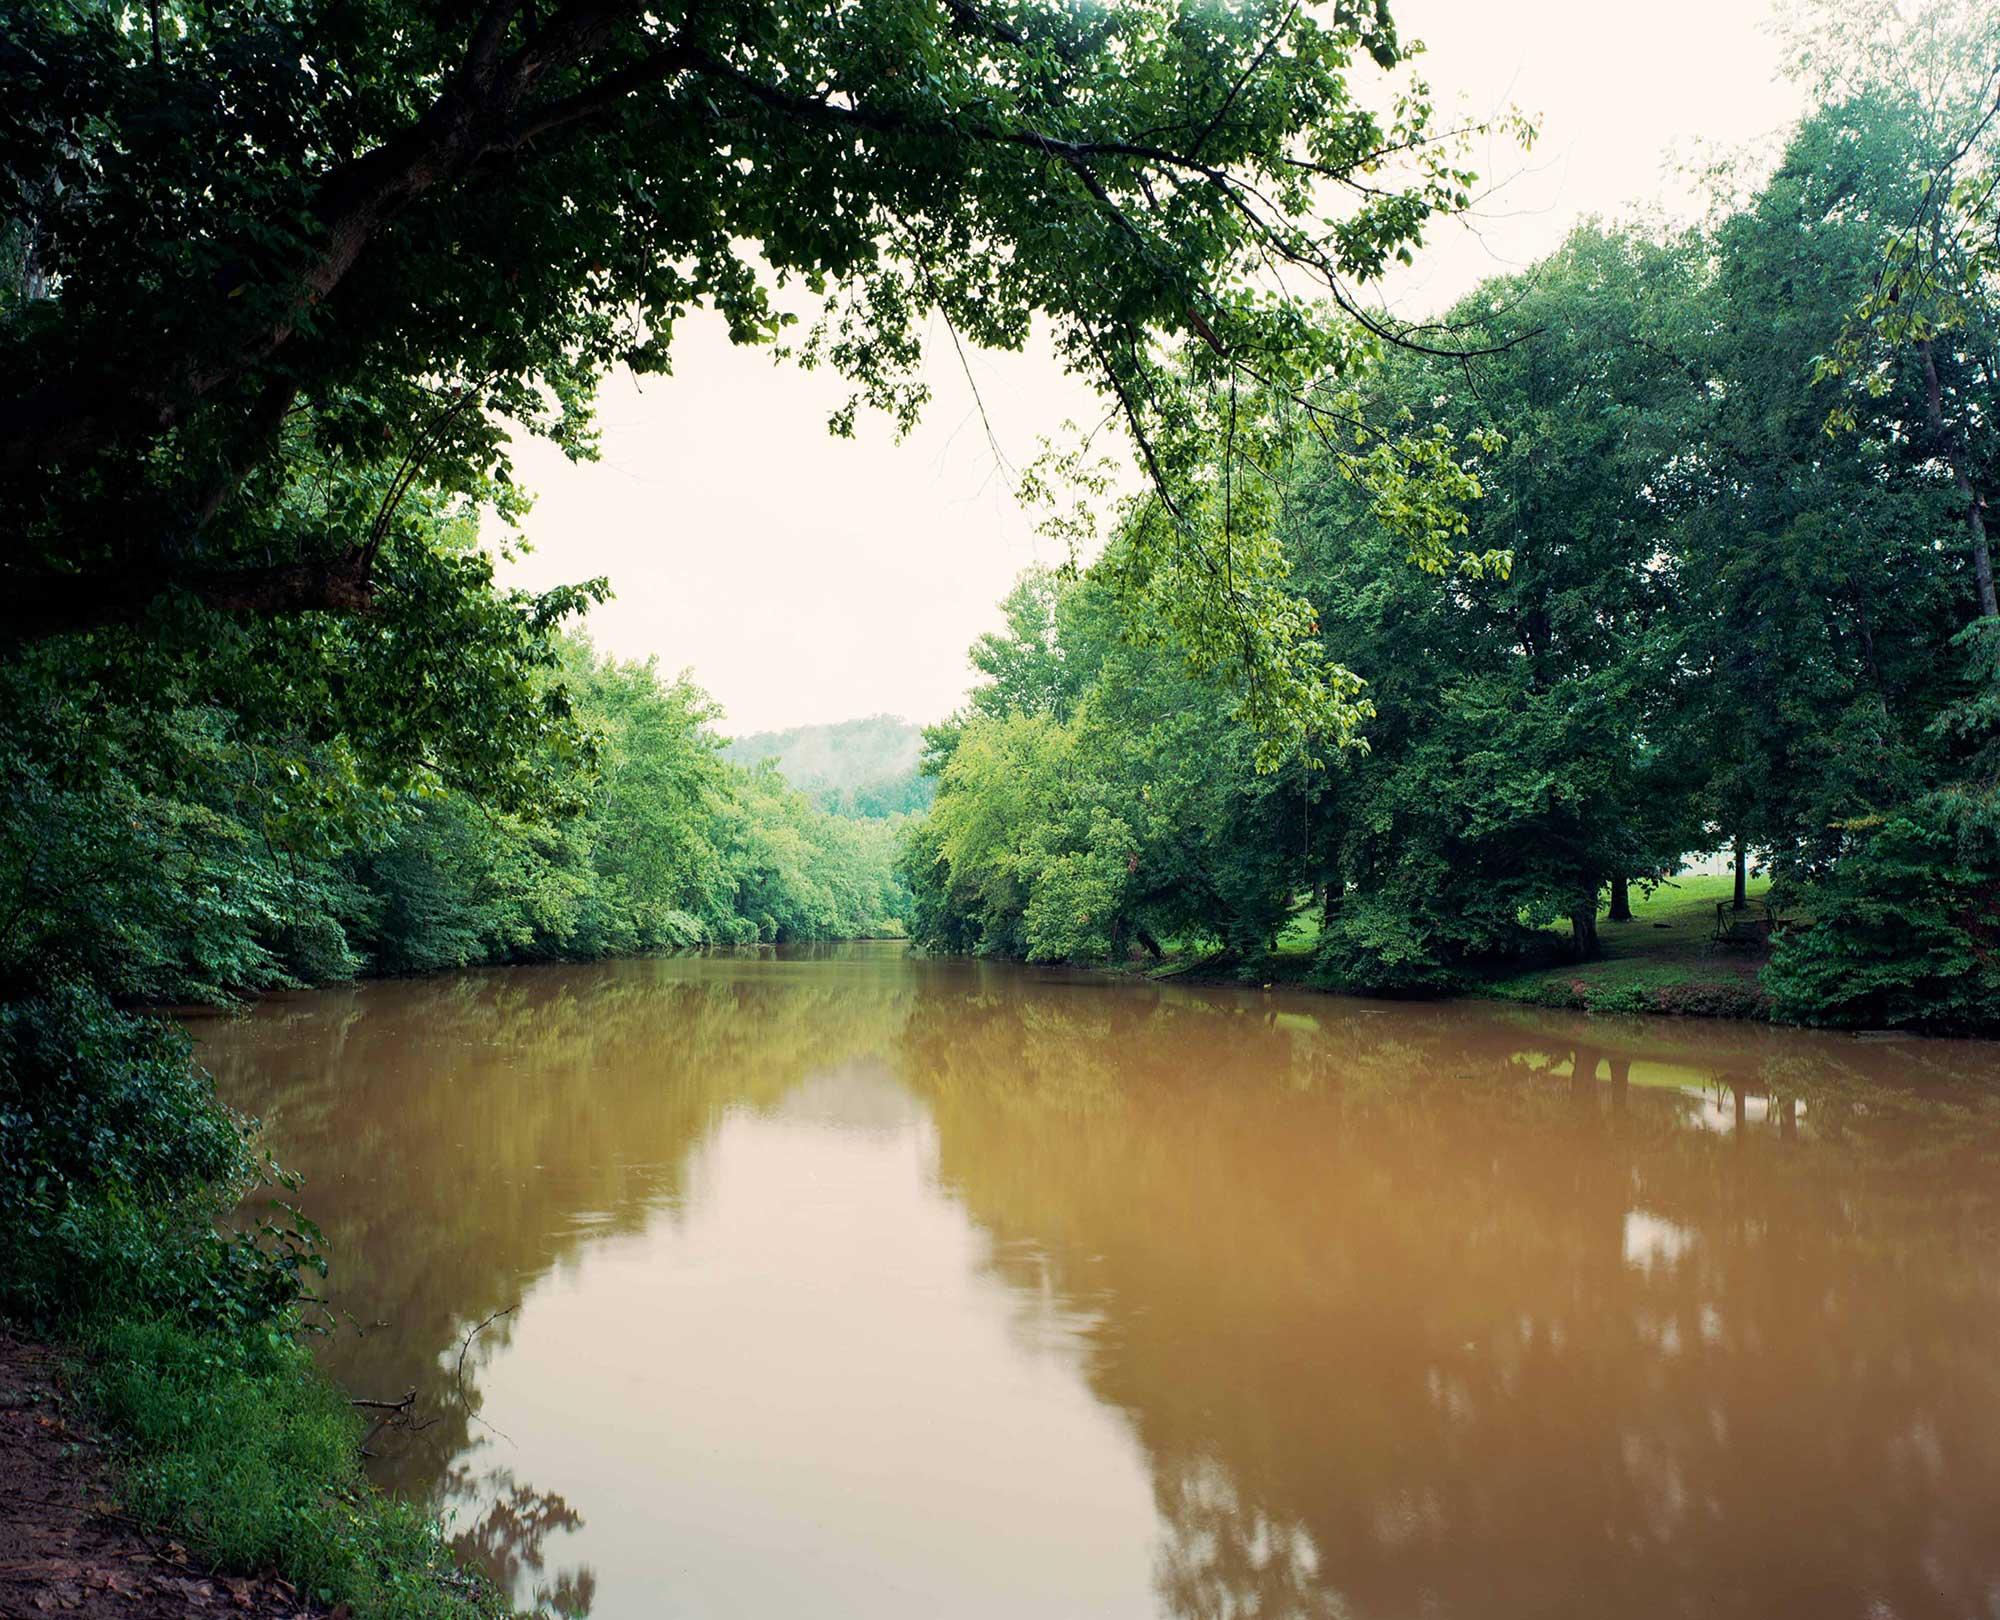 Rivière Poca Basin, West Virginia 2012